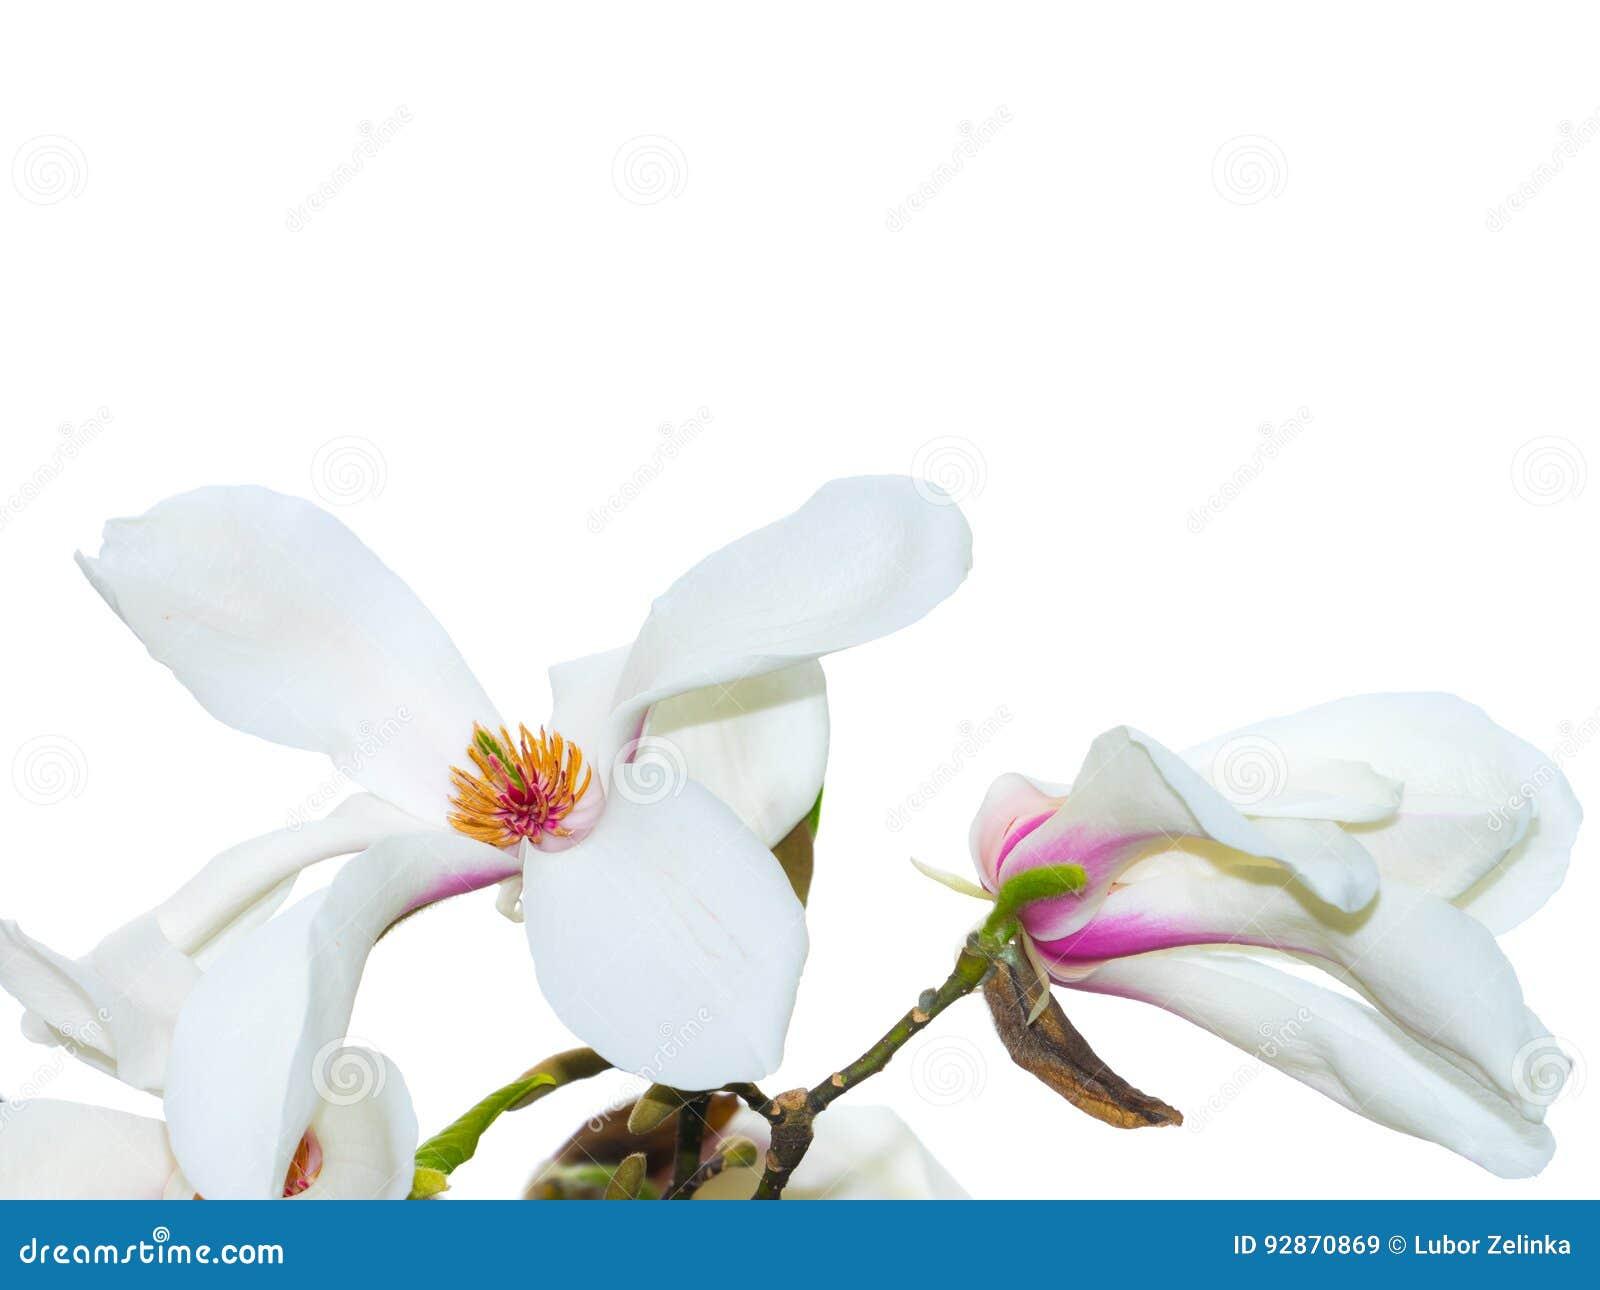 White Magnolia Flower With White Background Stock Image Image Of